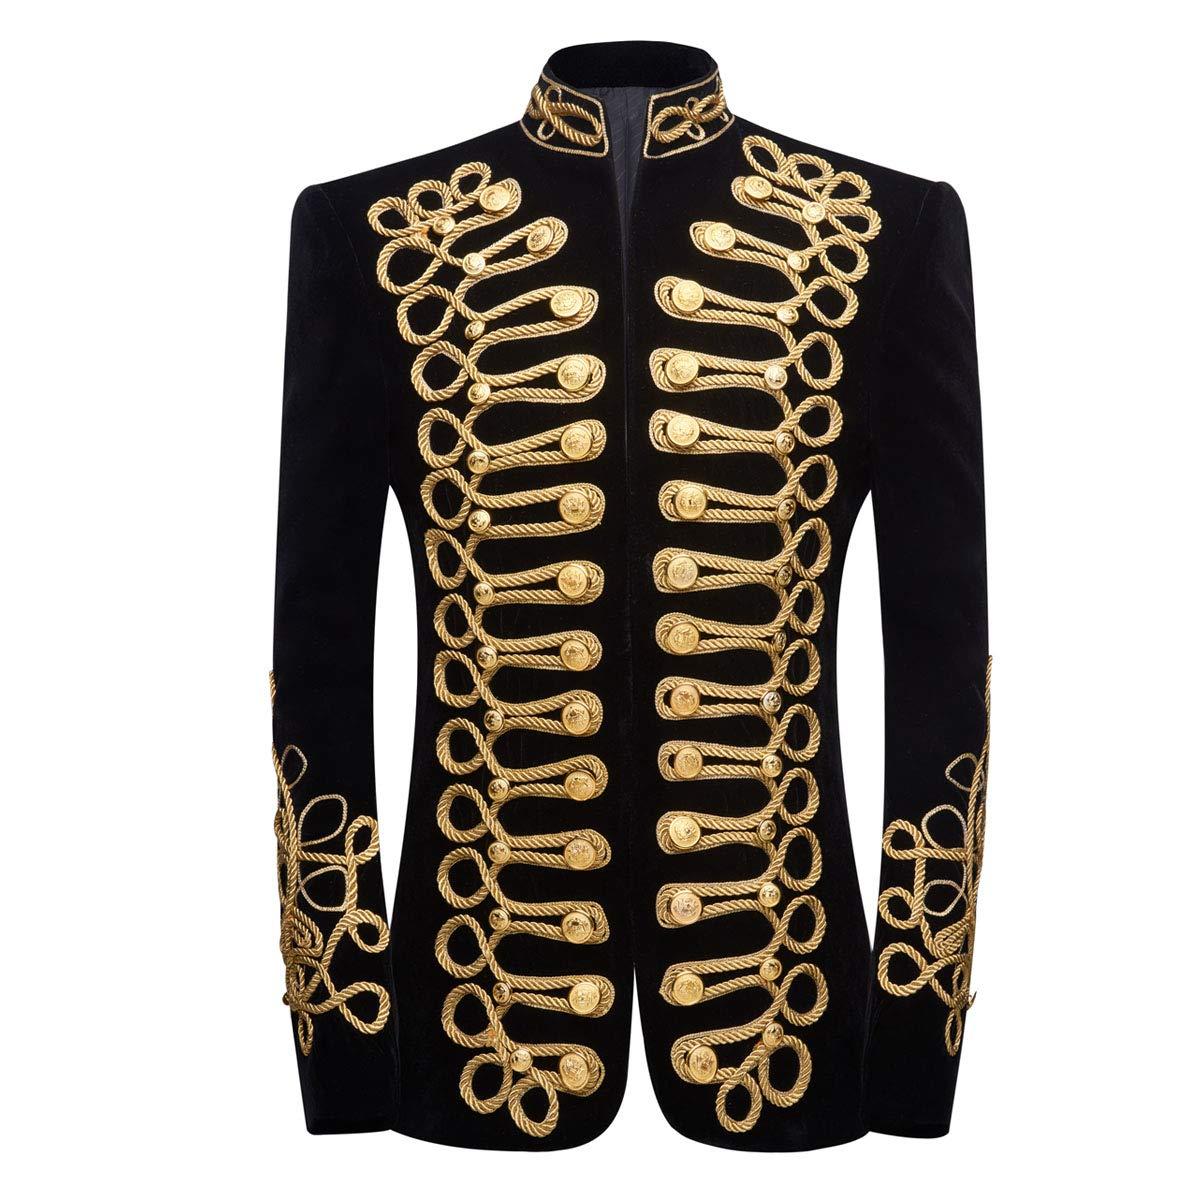 PYJTRL Mens Stylish Court Prince Black Velvet Gold Embroidery Blazer Suit Jacket (Black Gold, US 44R) by PYJTRL